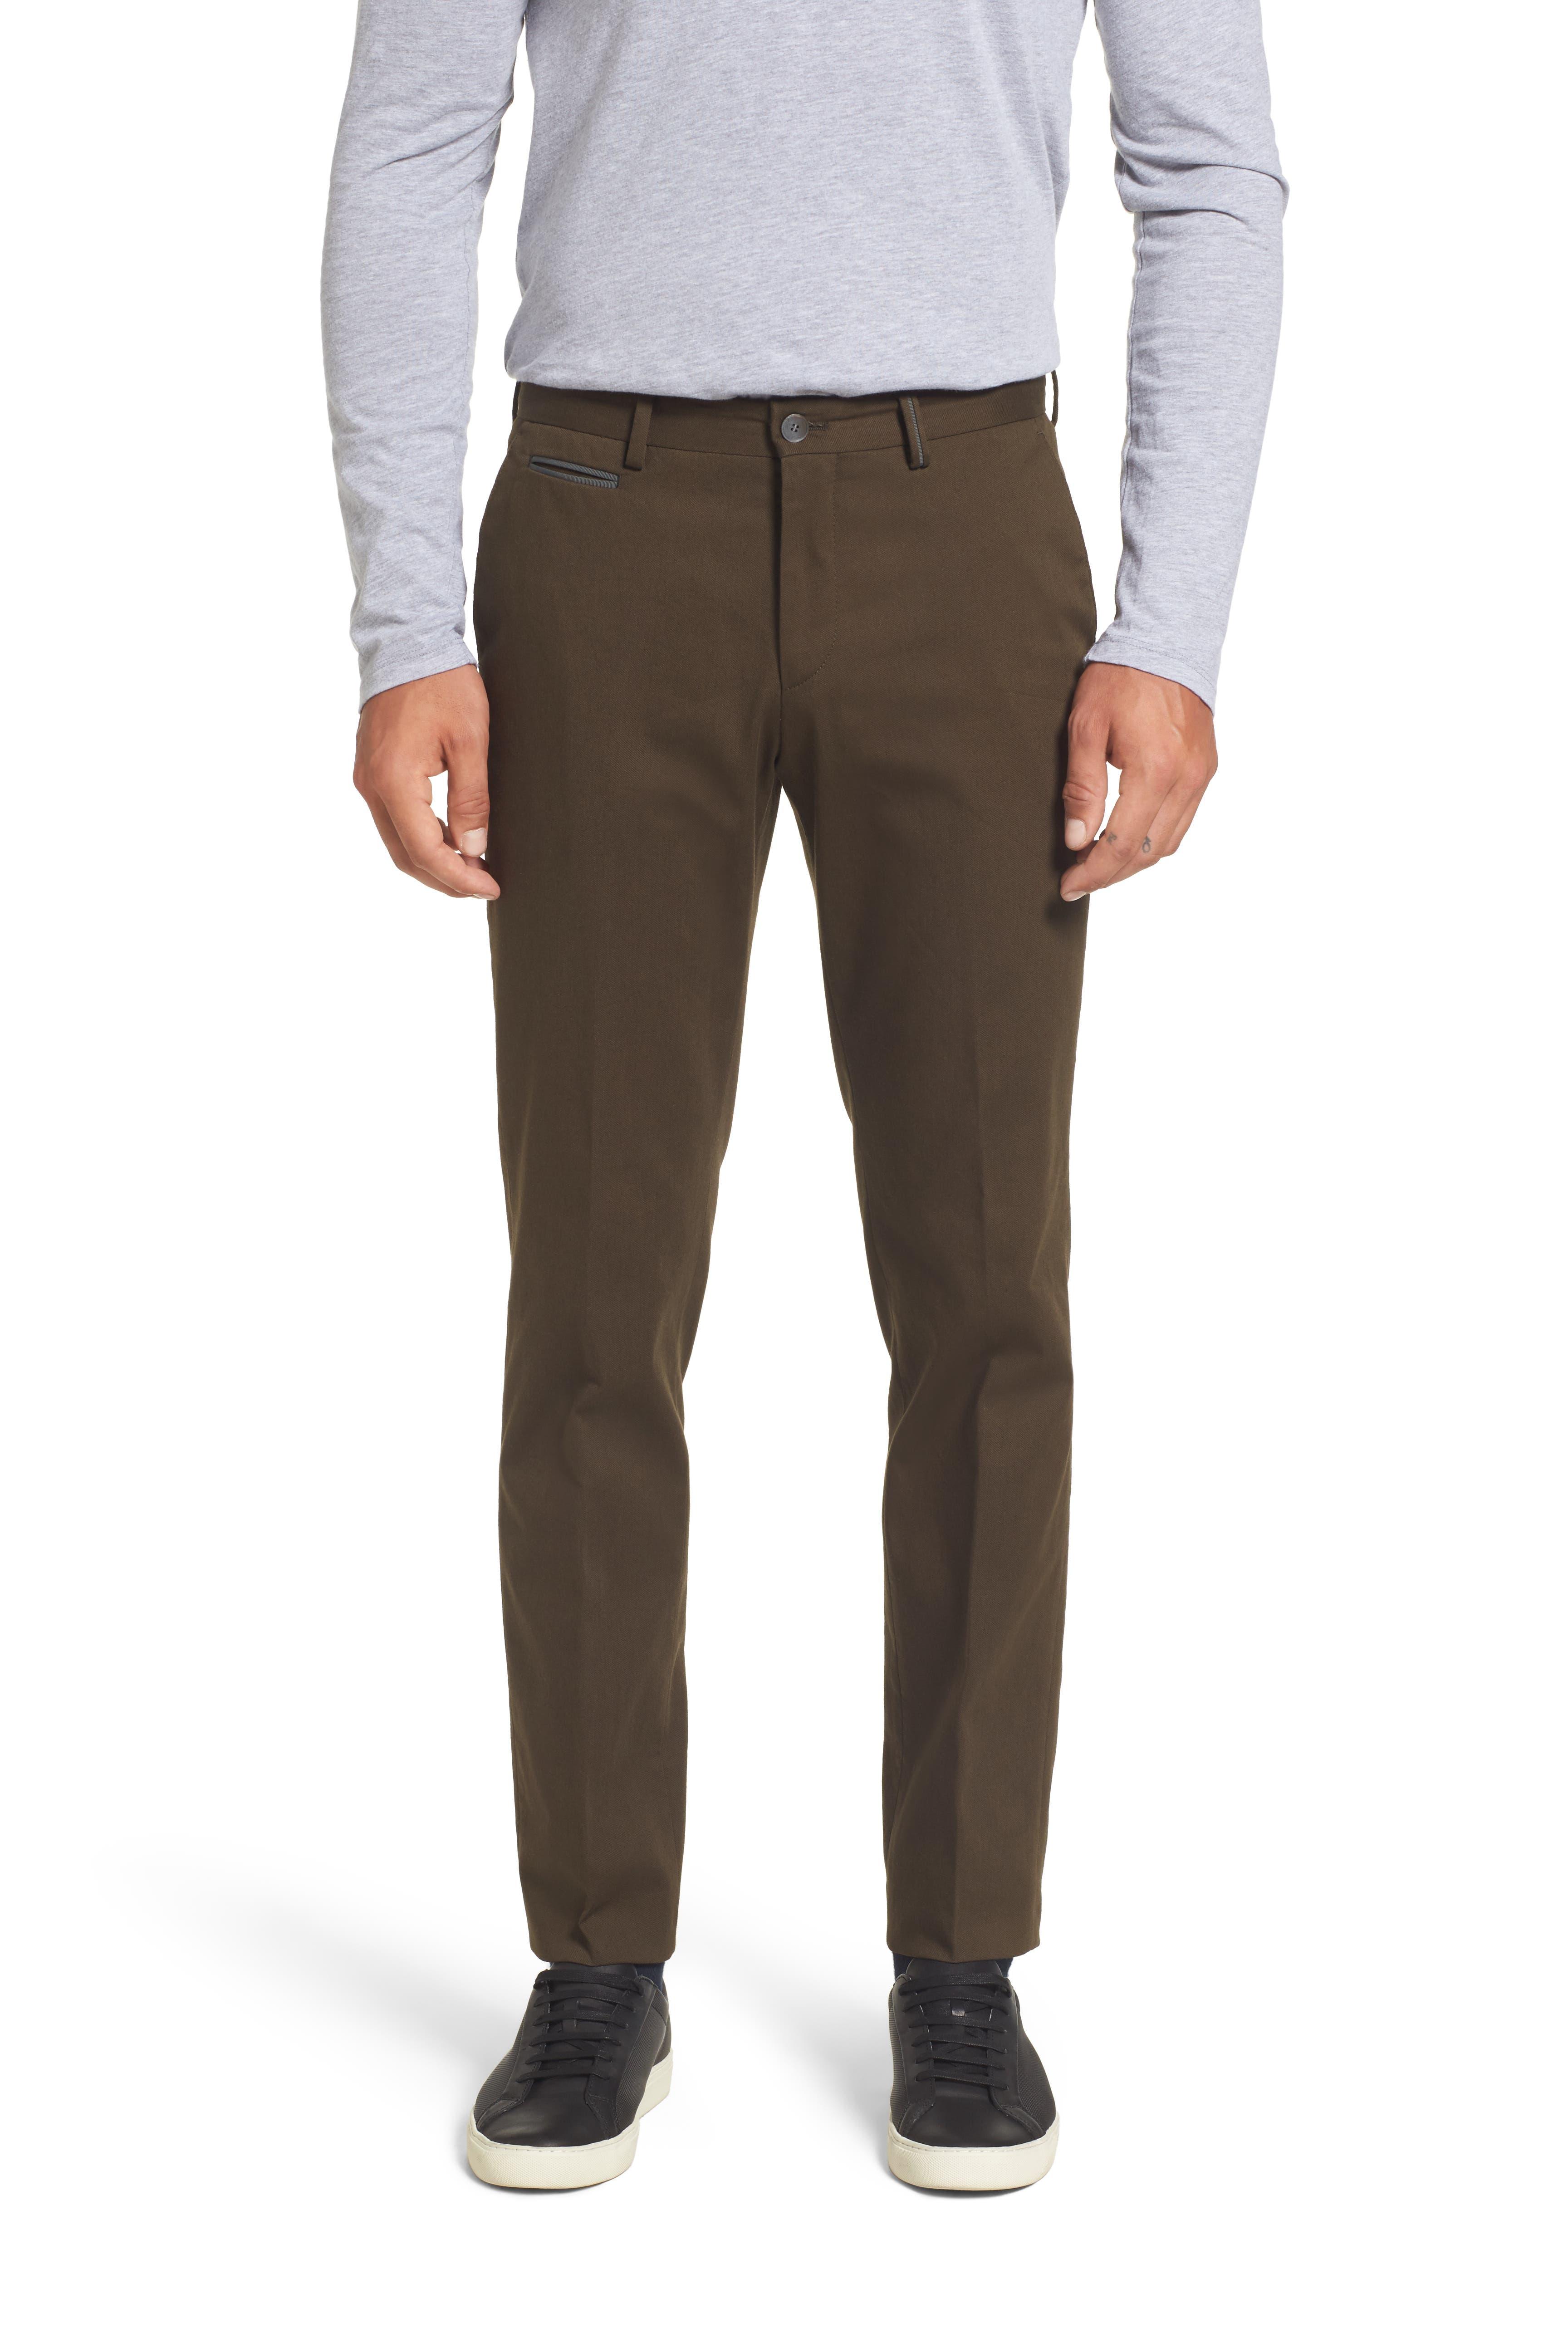 Batho-W Regular Fit Trousers,                         Main,                         color, 342